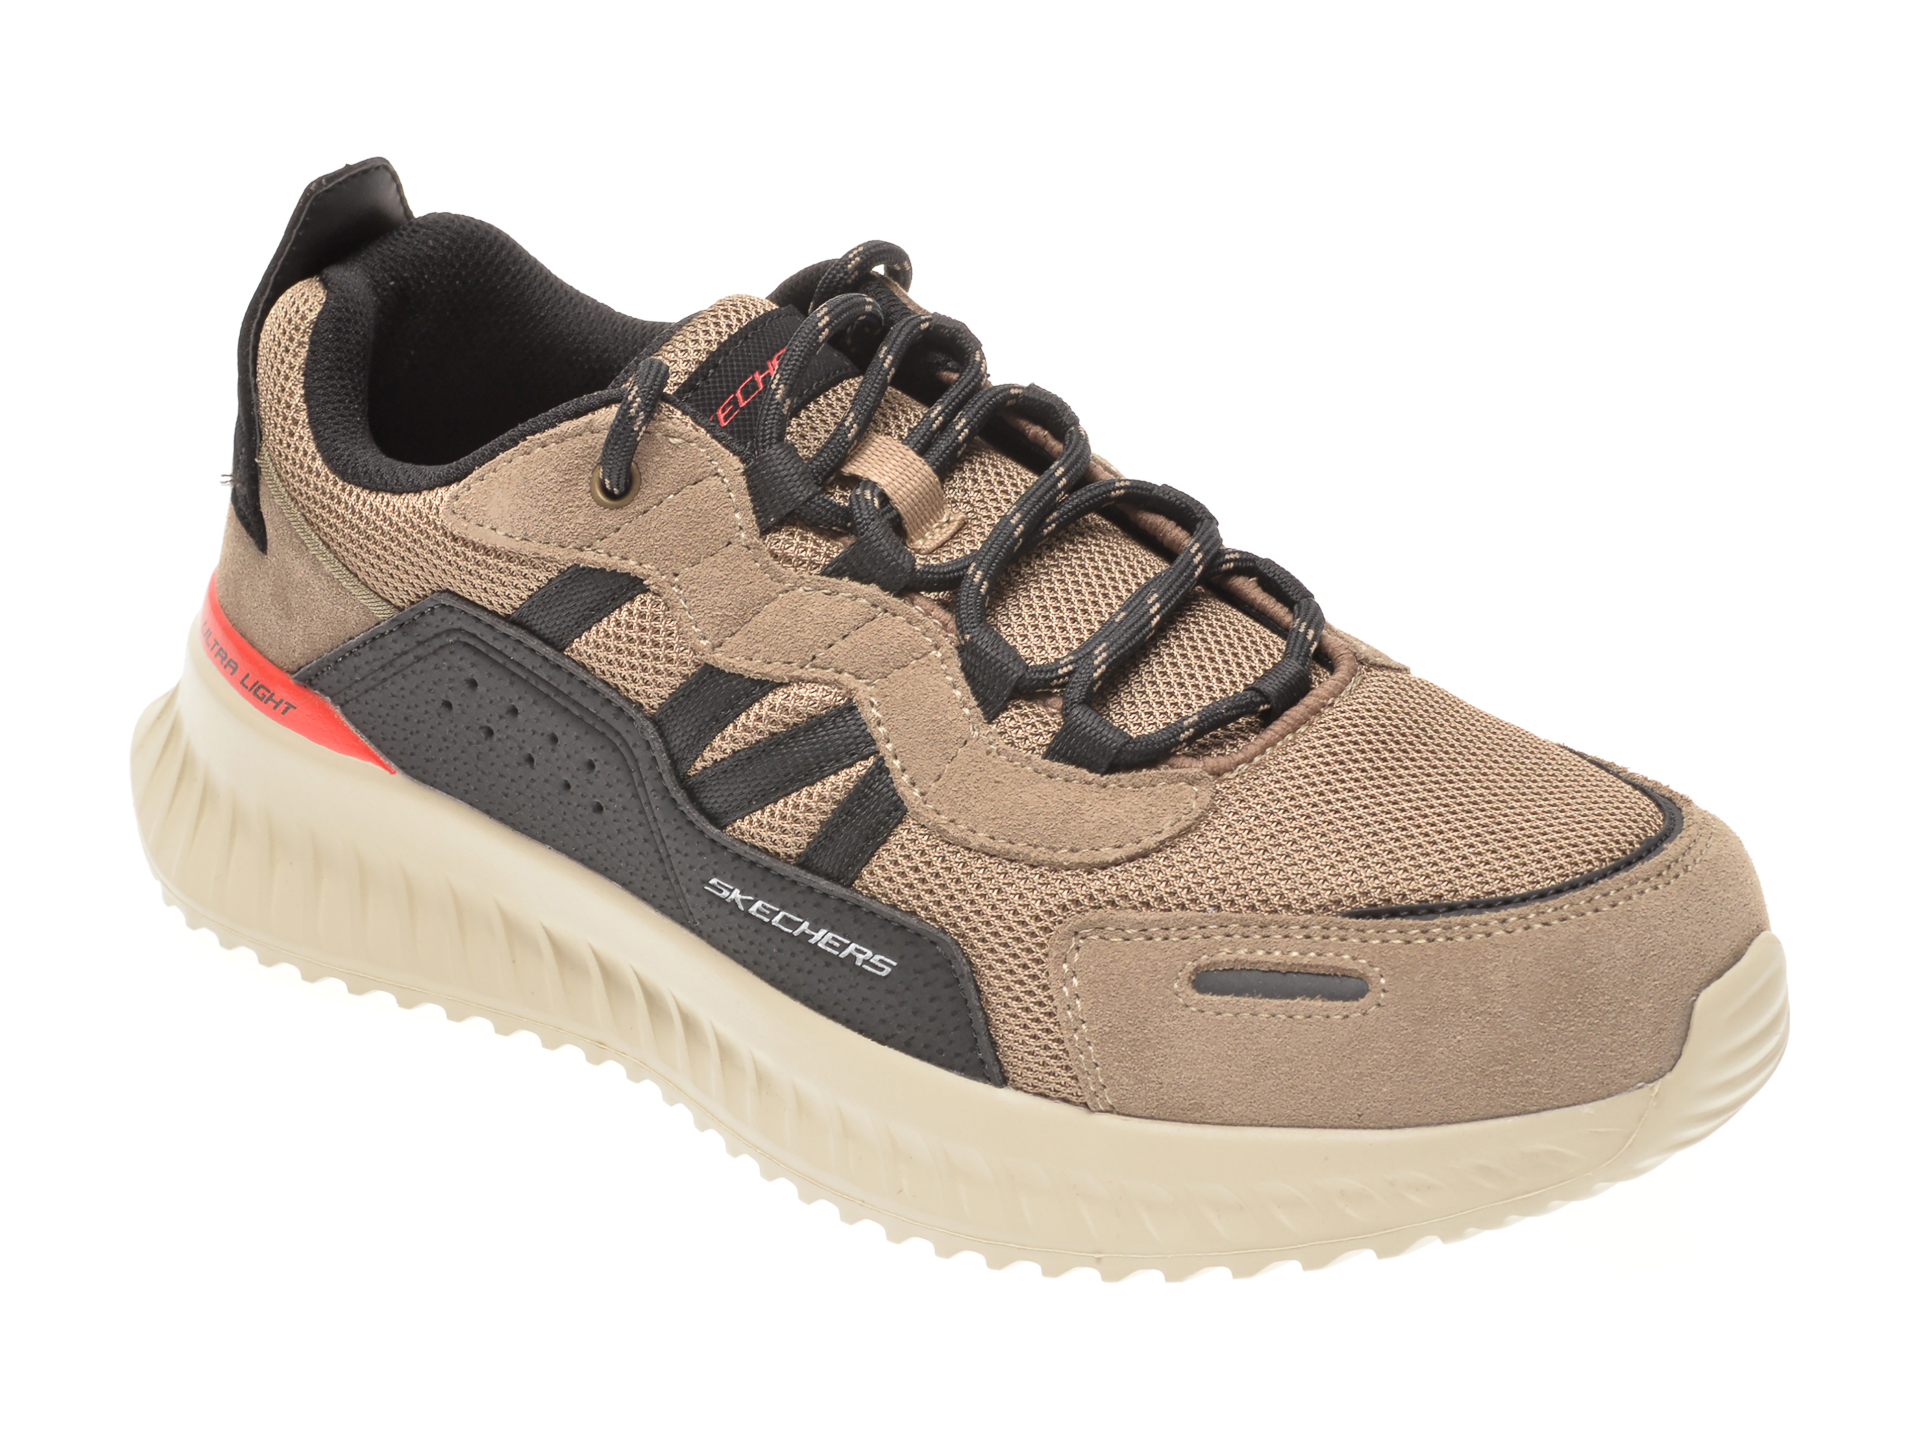 Pantofi Sport Skechers Maro, Matera 2.0 Ximino, Din Material Textil Si Piele Intoarsa